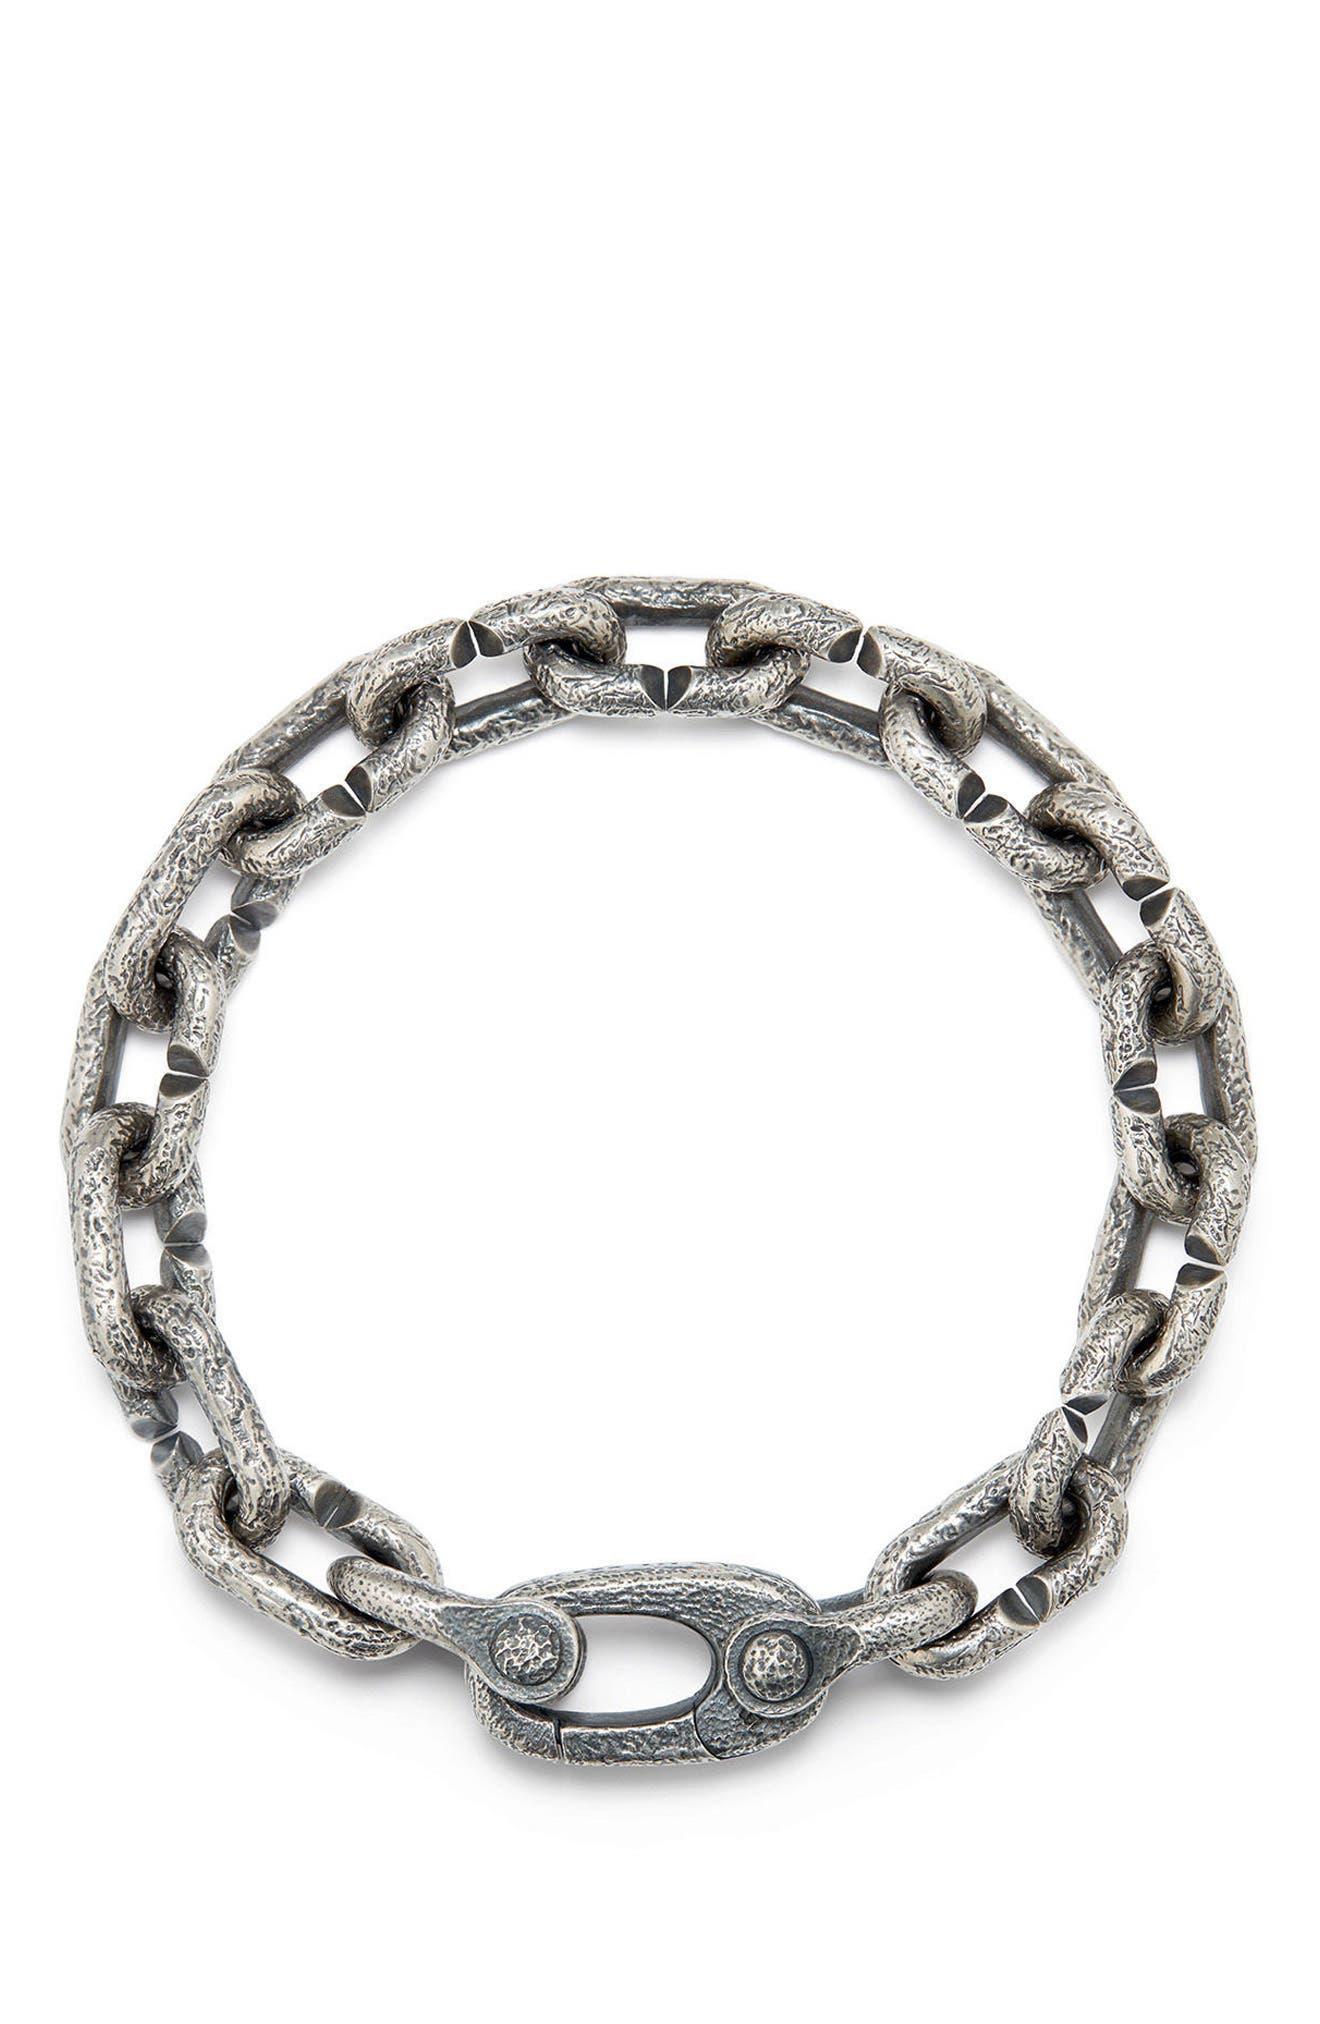 Shipwreck Chain Bracelet,                             Alternate thumbnail 2, color,                             SILVER